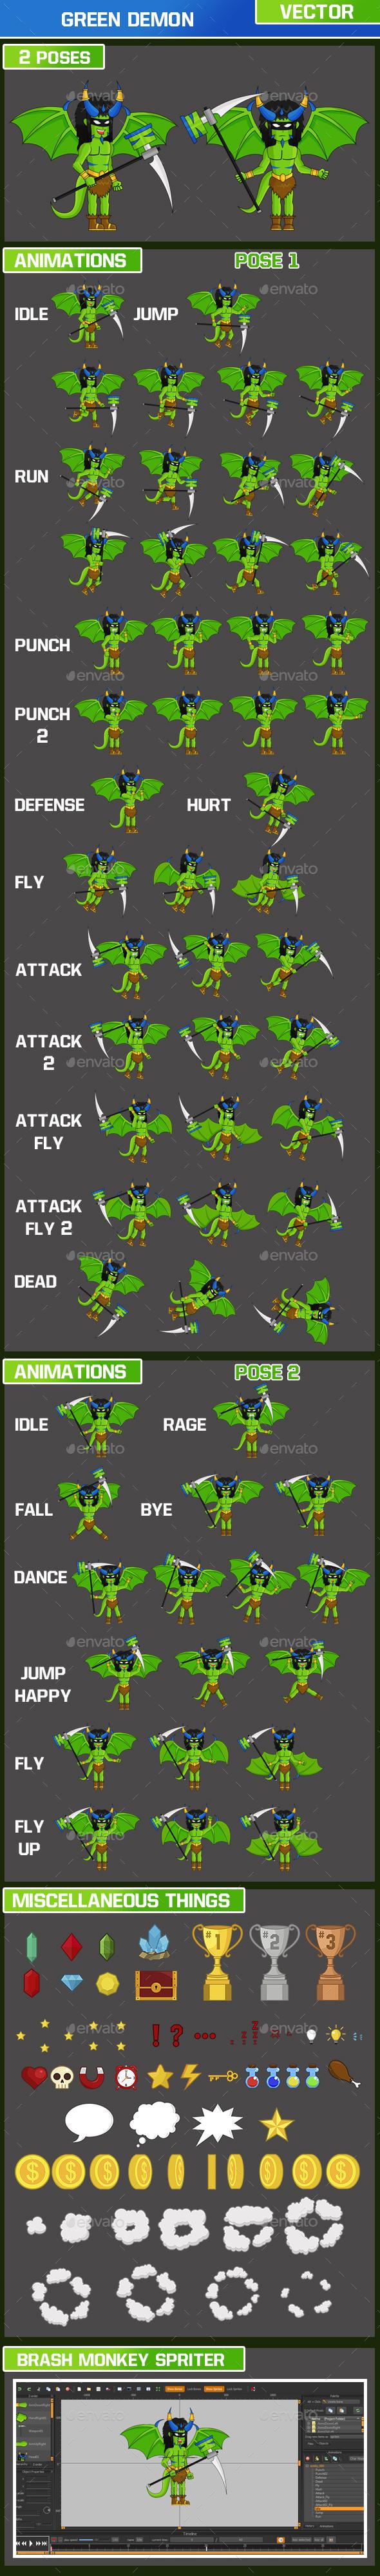 Green Demon Character